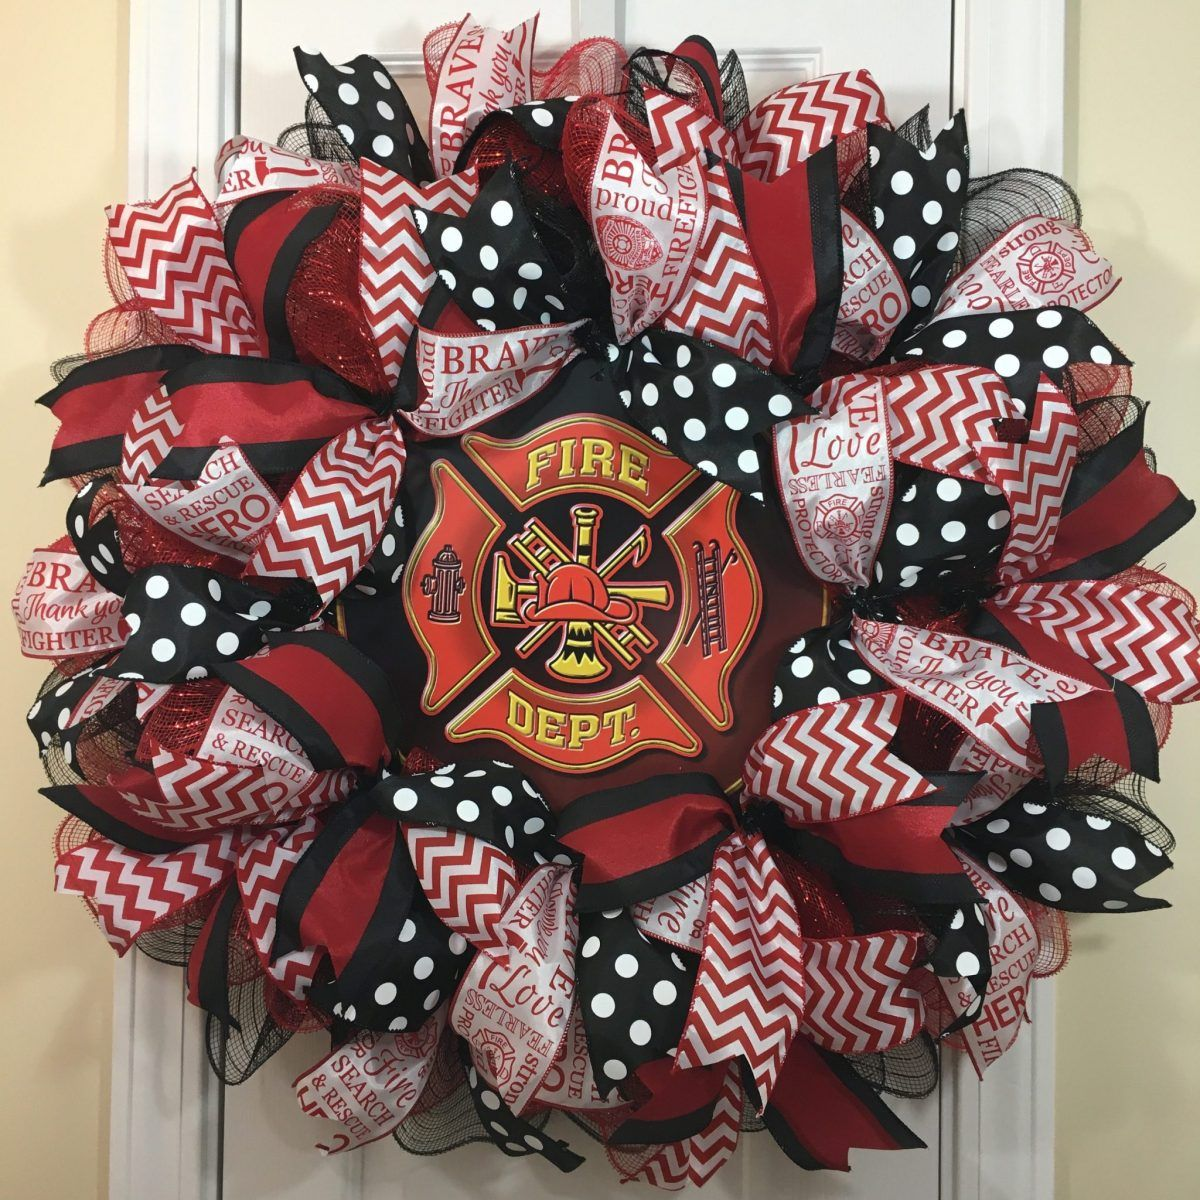 Firefighter wreath sign,